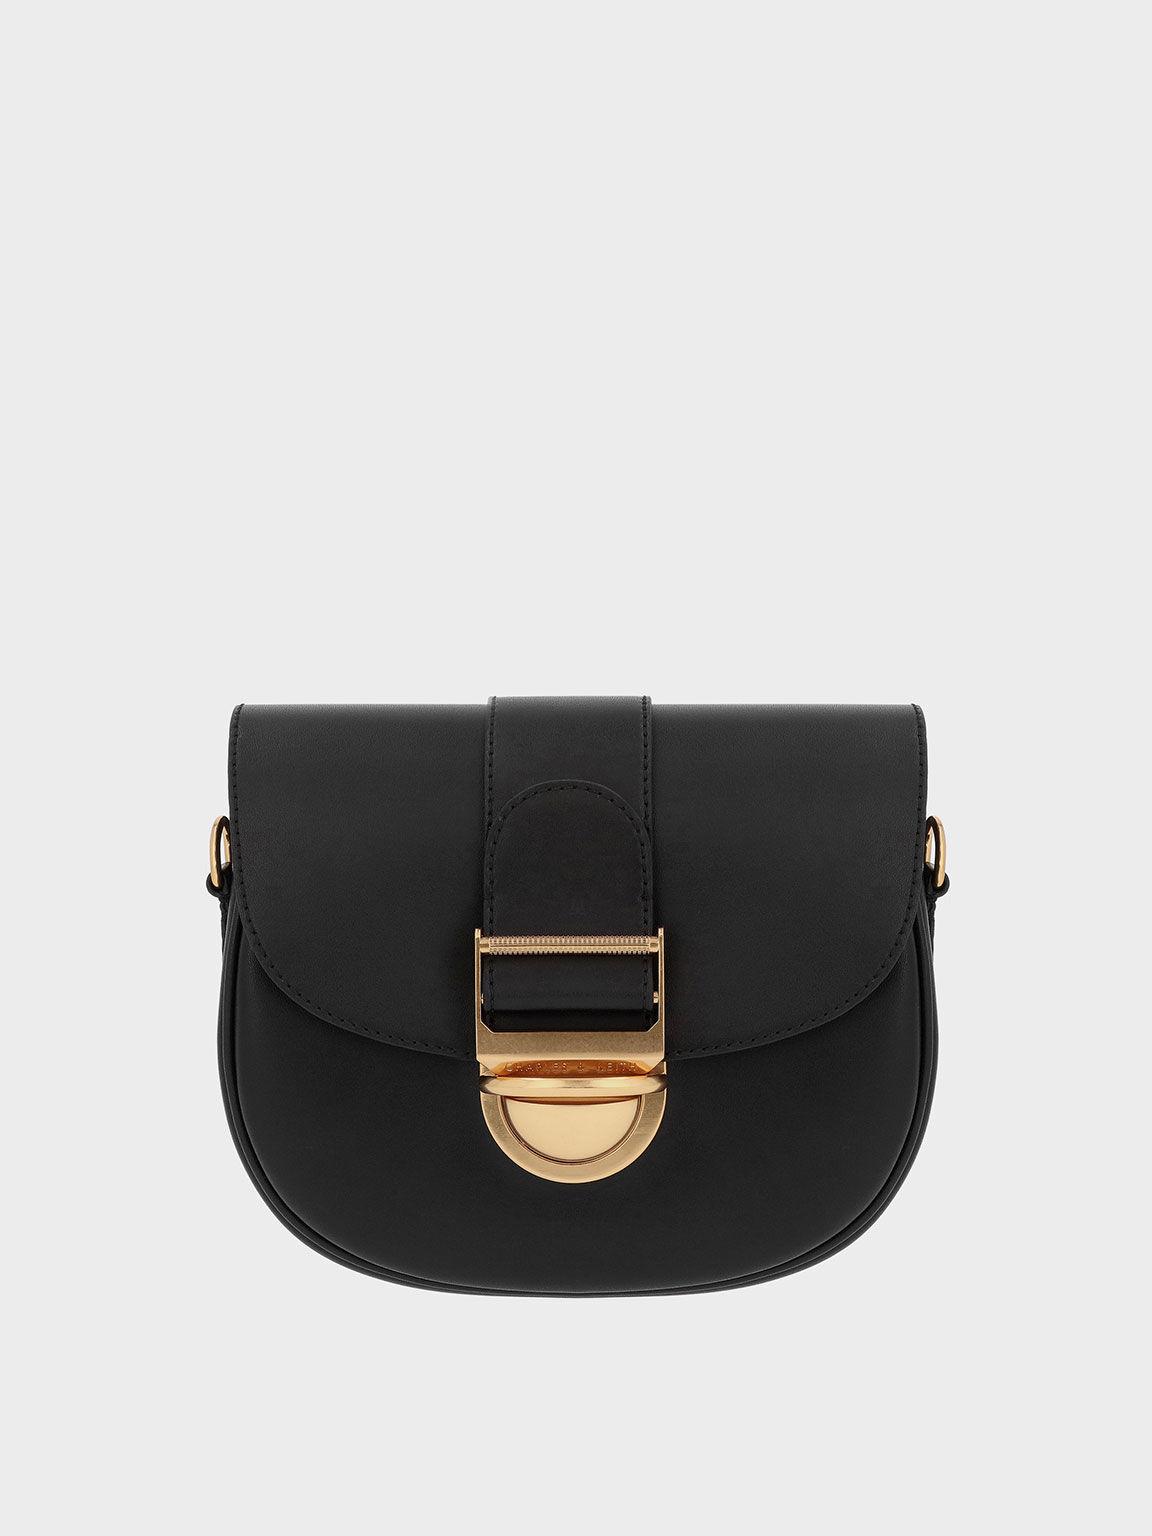 Amelia Metallic Push-Lock Crossbody Bag, Black, hi-res